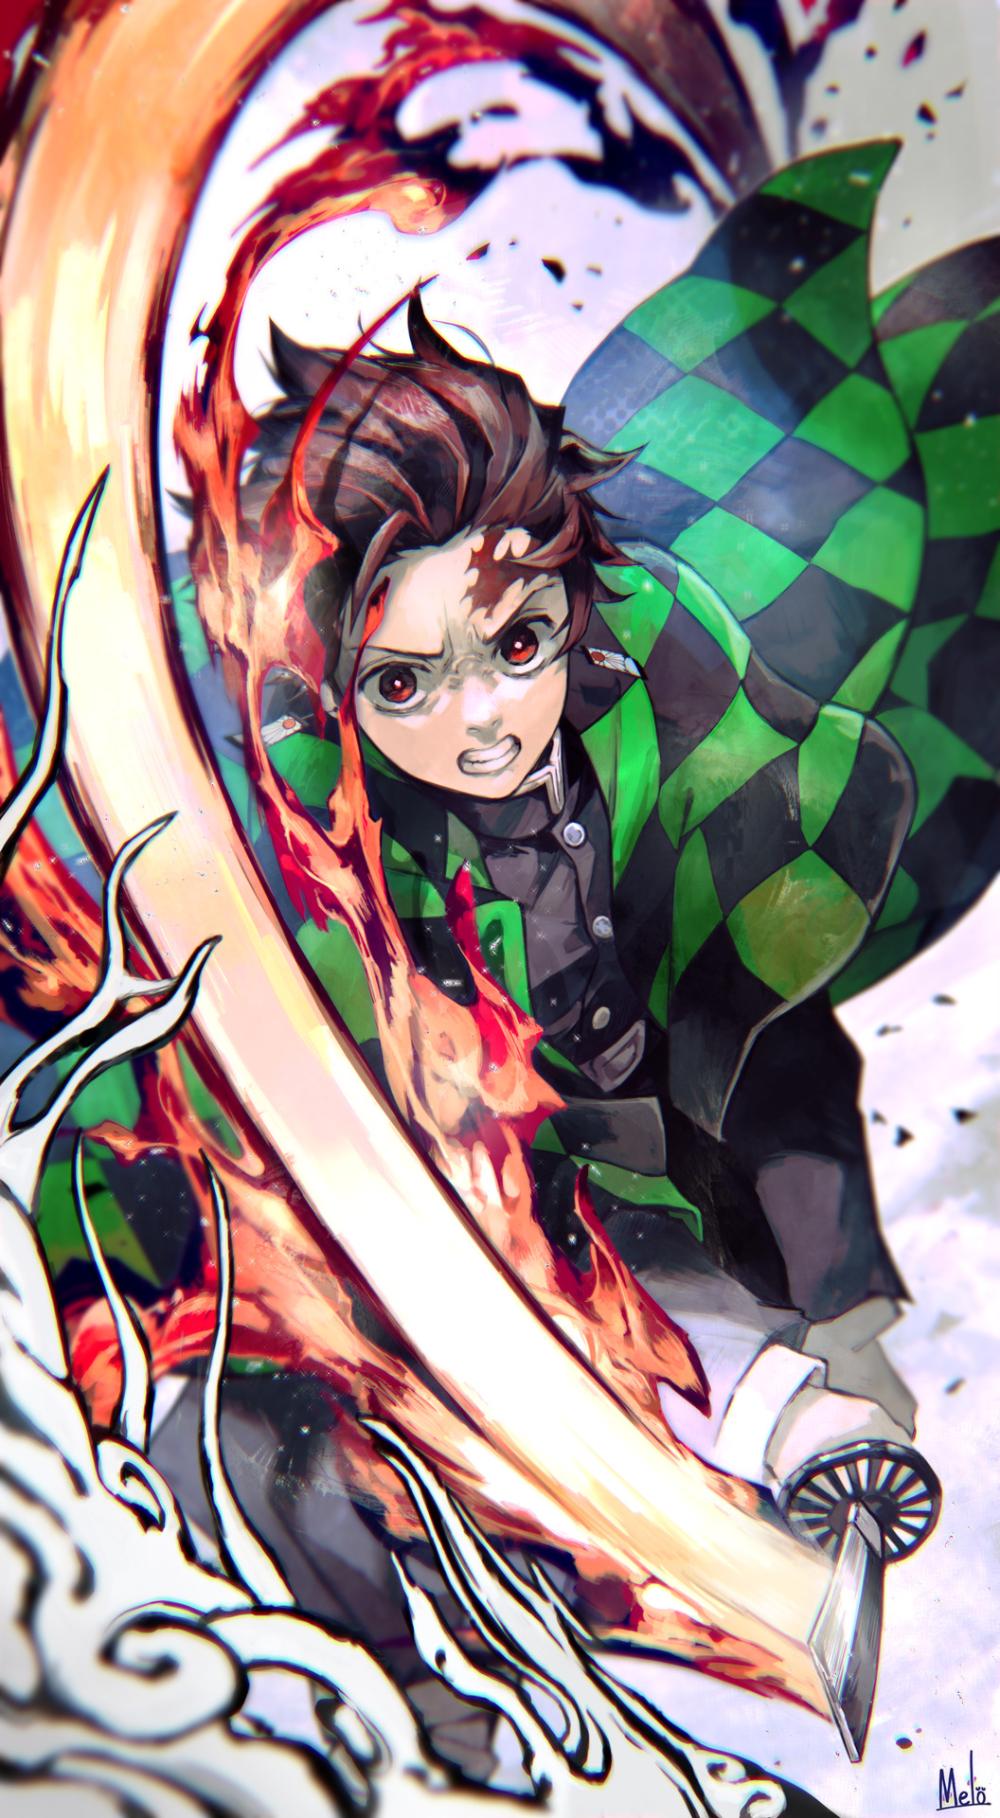 Dance of the Fire God Anime, Arte mangá e Otaku anime